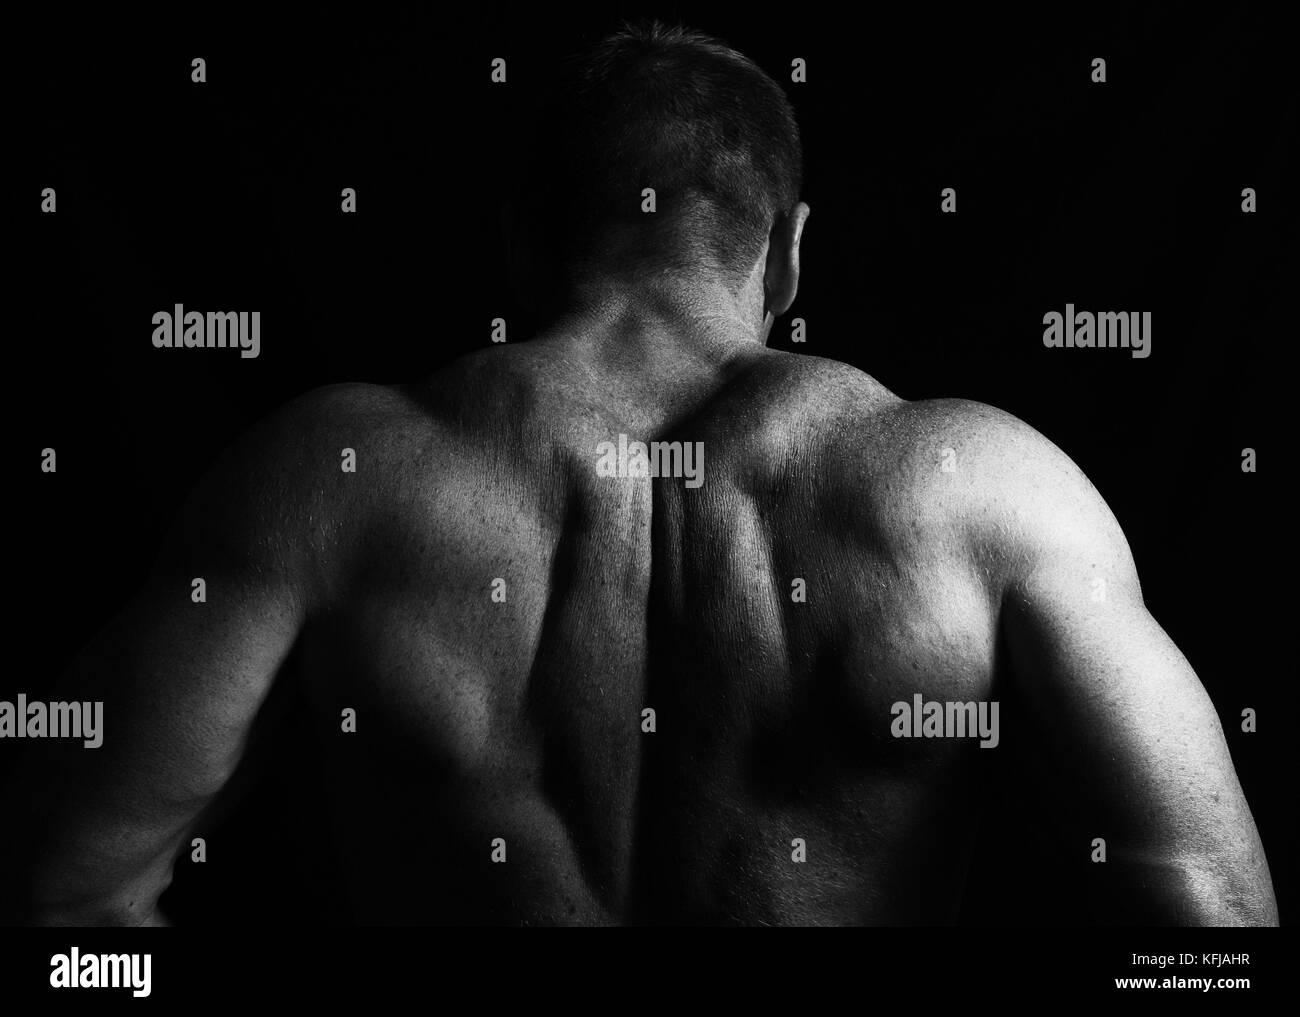 Body builder black and white stock photo 164516627 alamy